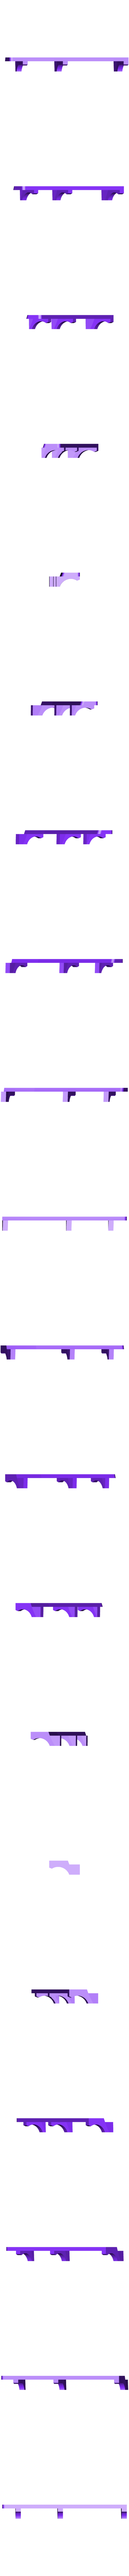 Run_Board_Front-C.STL Download free STL file 4-8-8-4 Big Boy Locomotive • 3D printer object, RaymondDeLuca